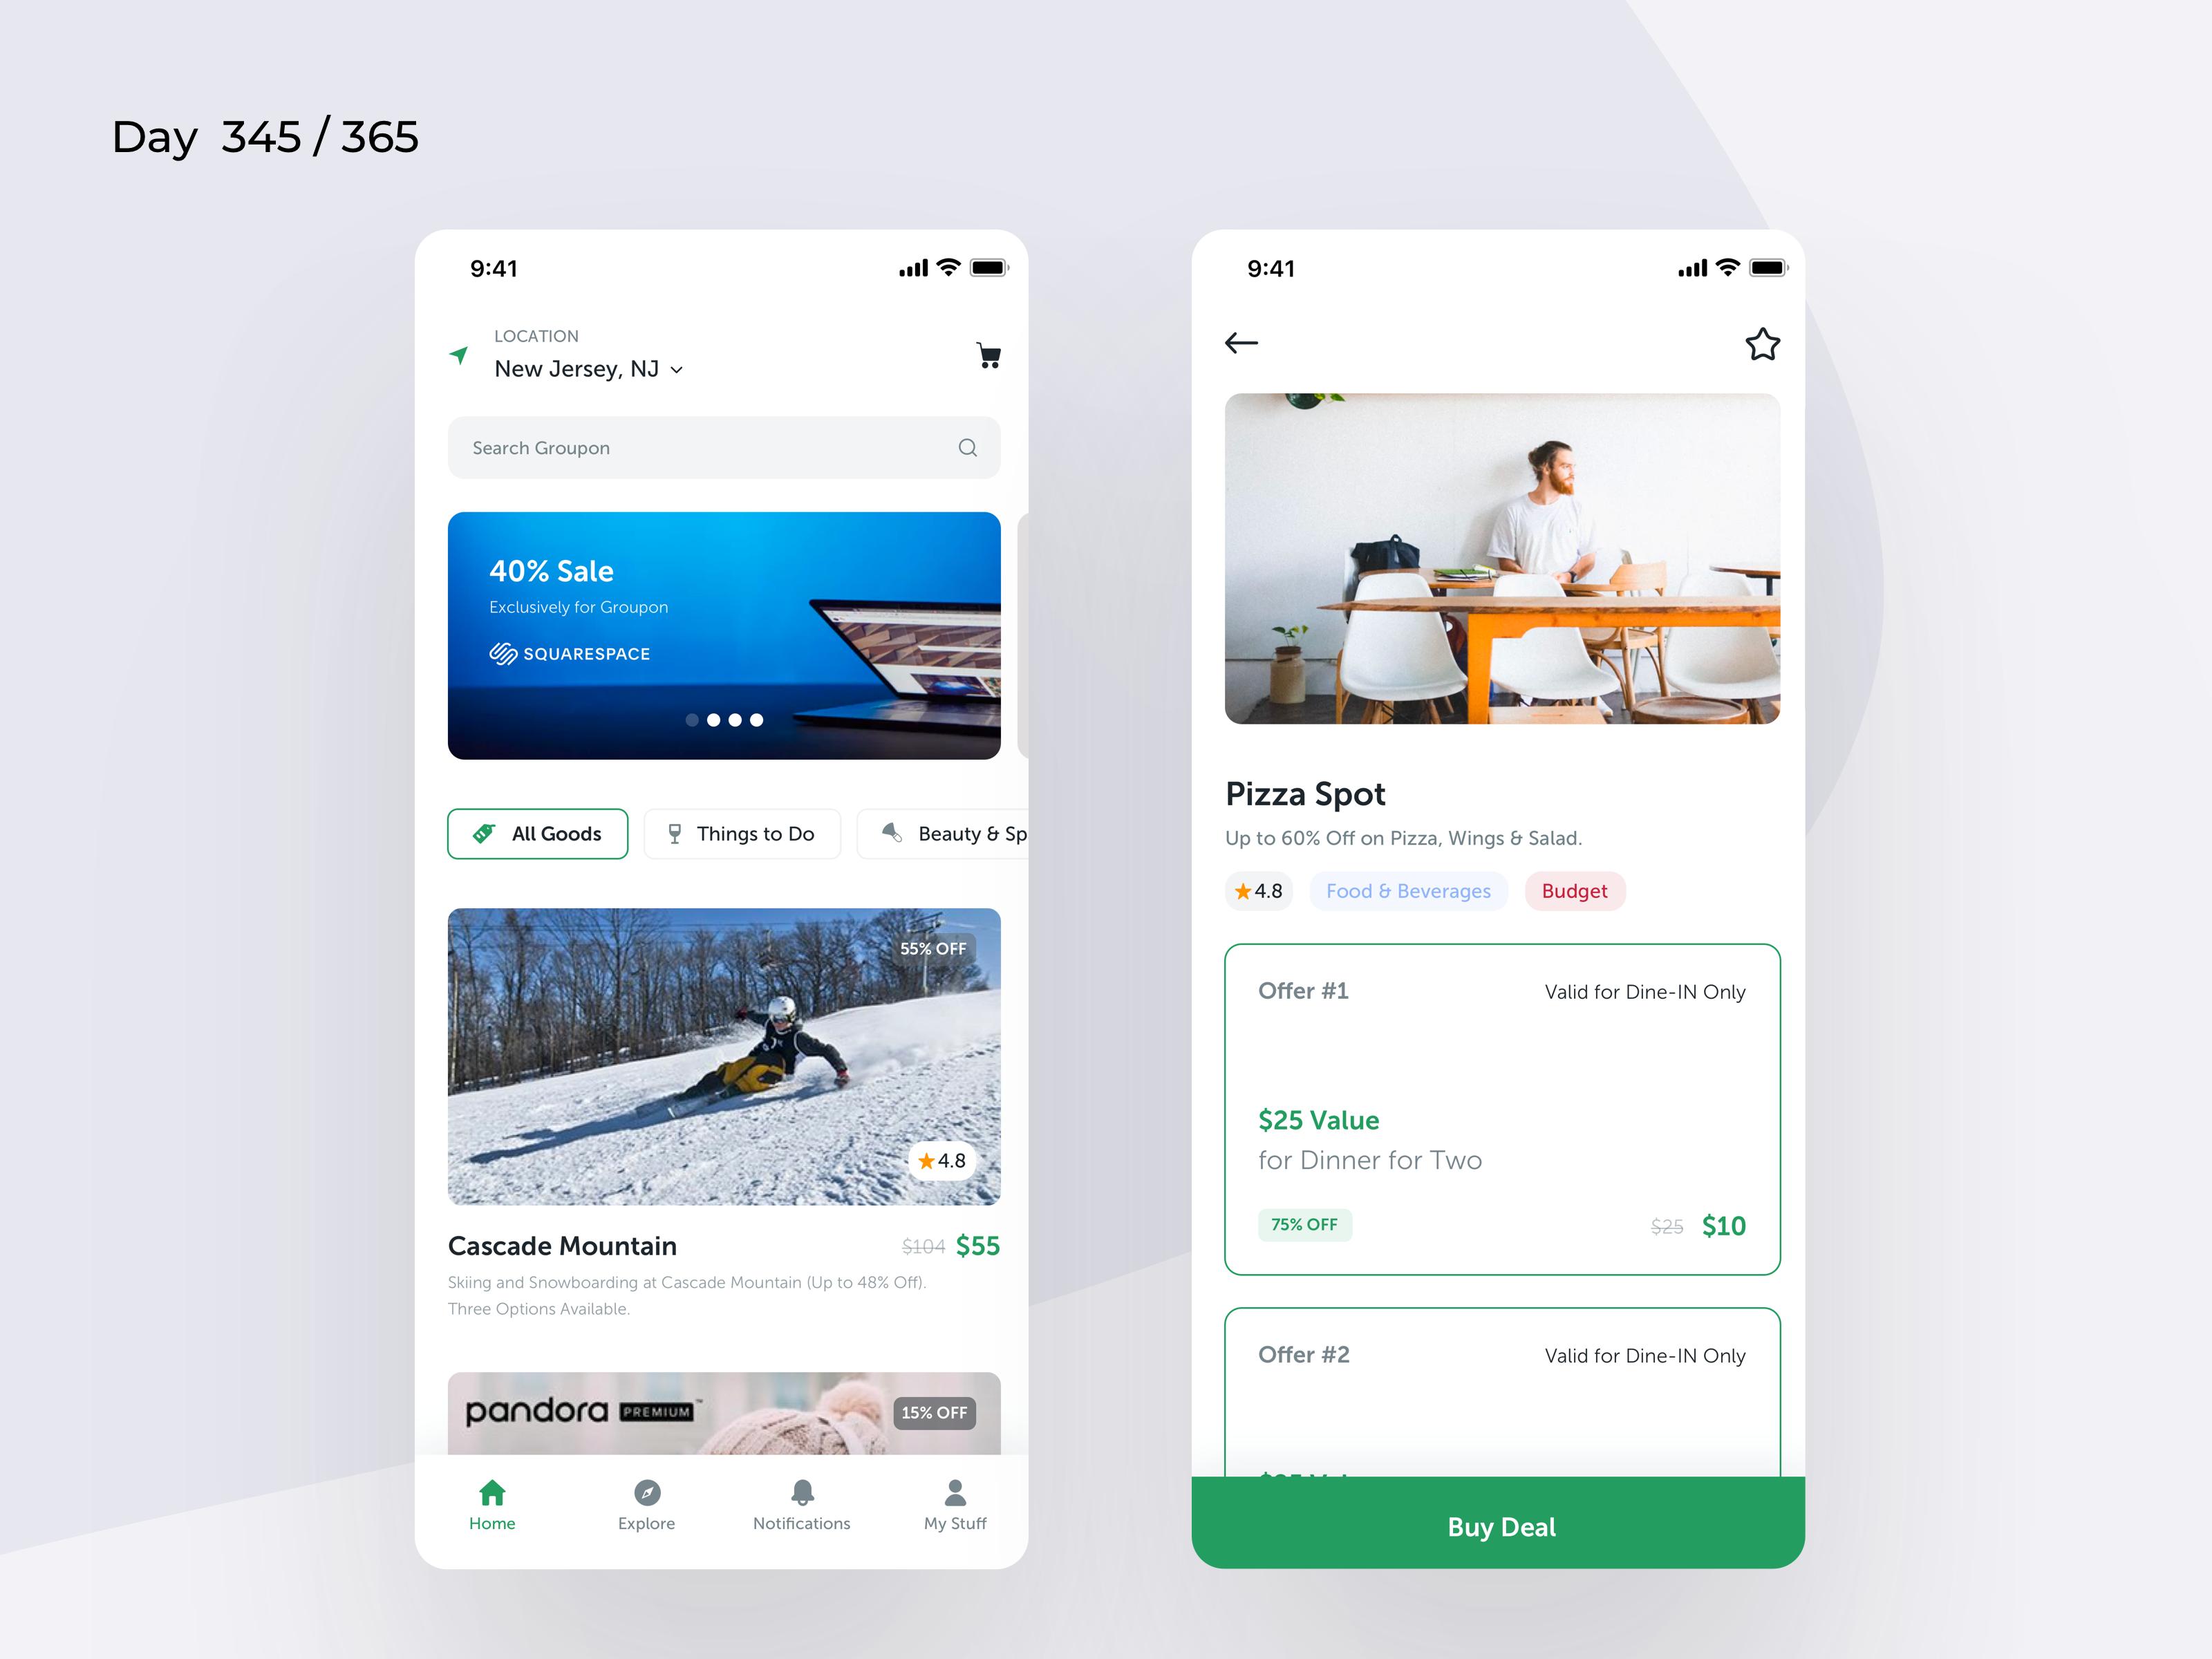 Groupon Mobile App Redesign Day 345 365 Project365 App Development Design Trip Planner App App